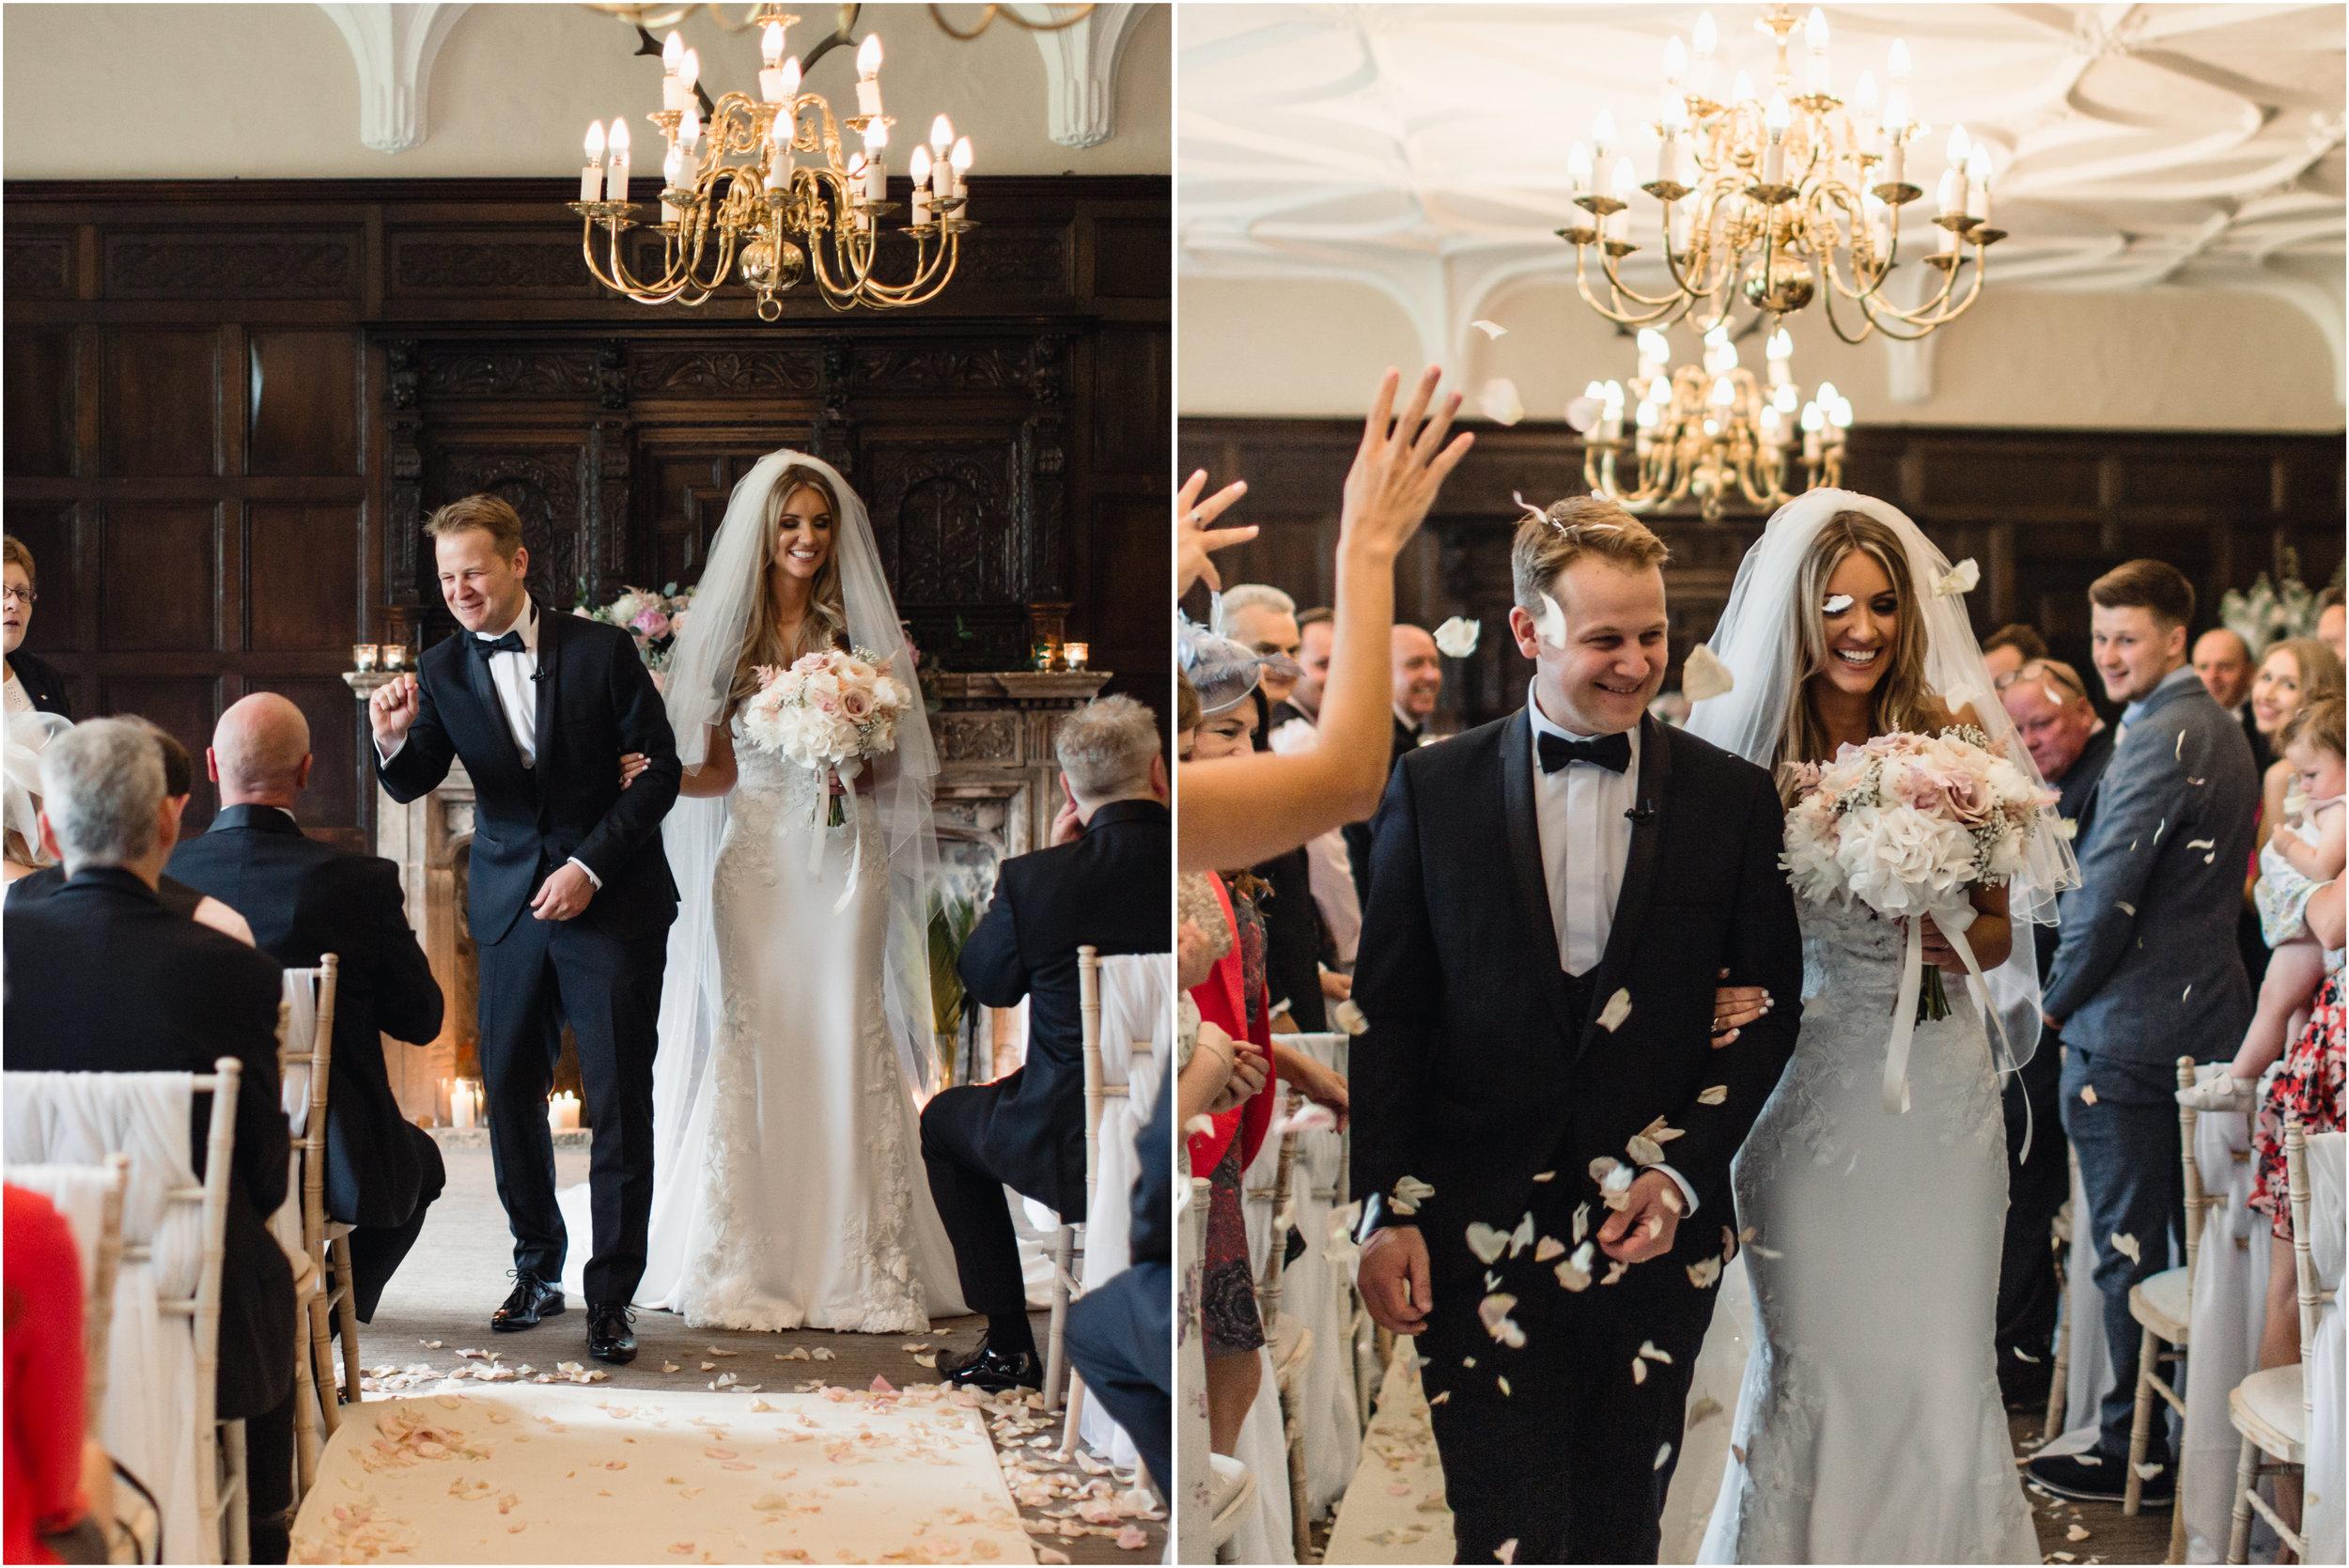 Rebecca Searle Wedding Photography Surrey London Luxury 46.jpg